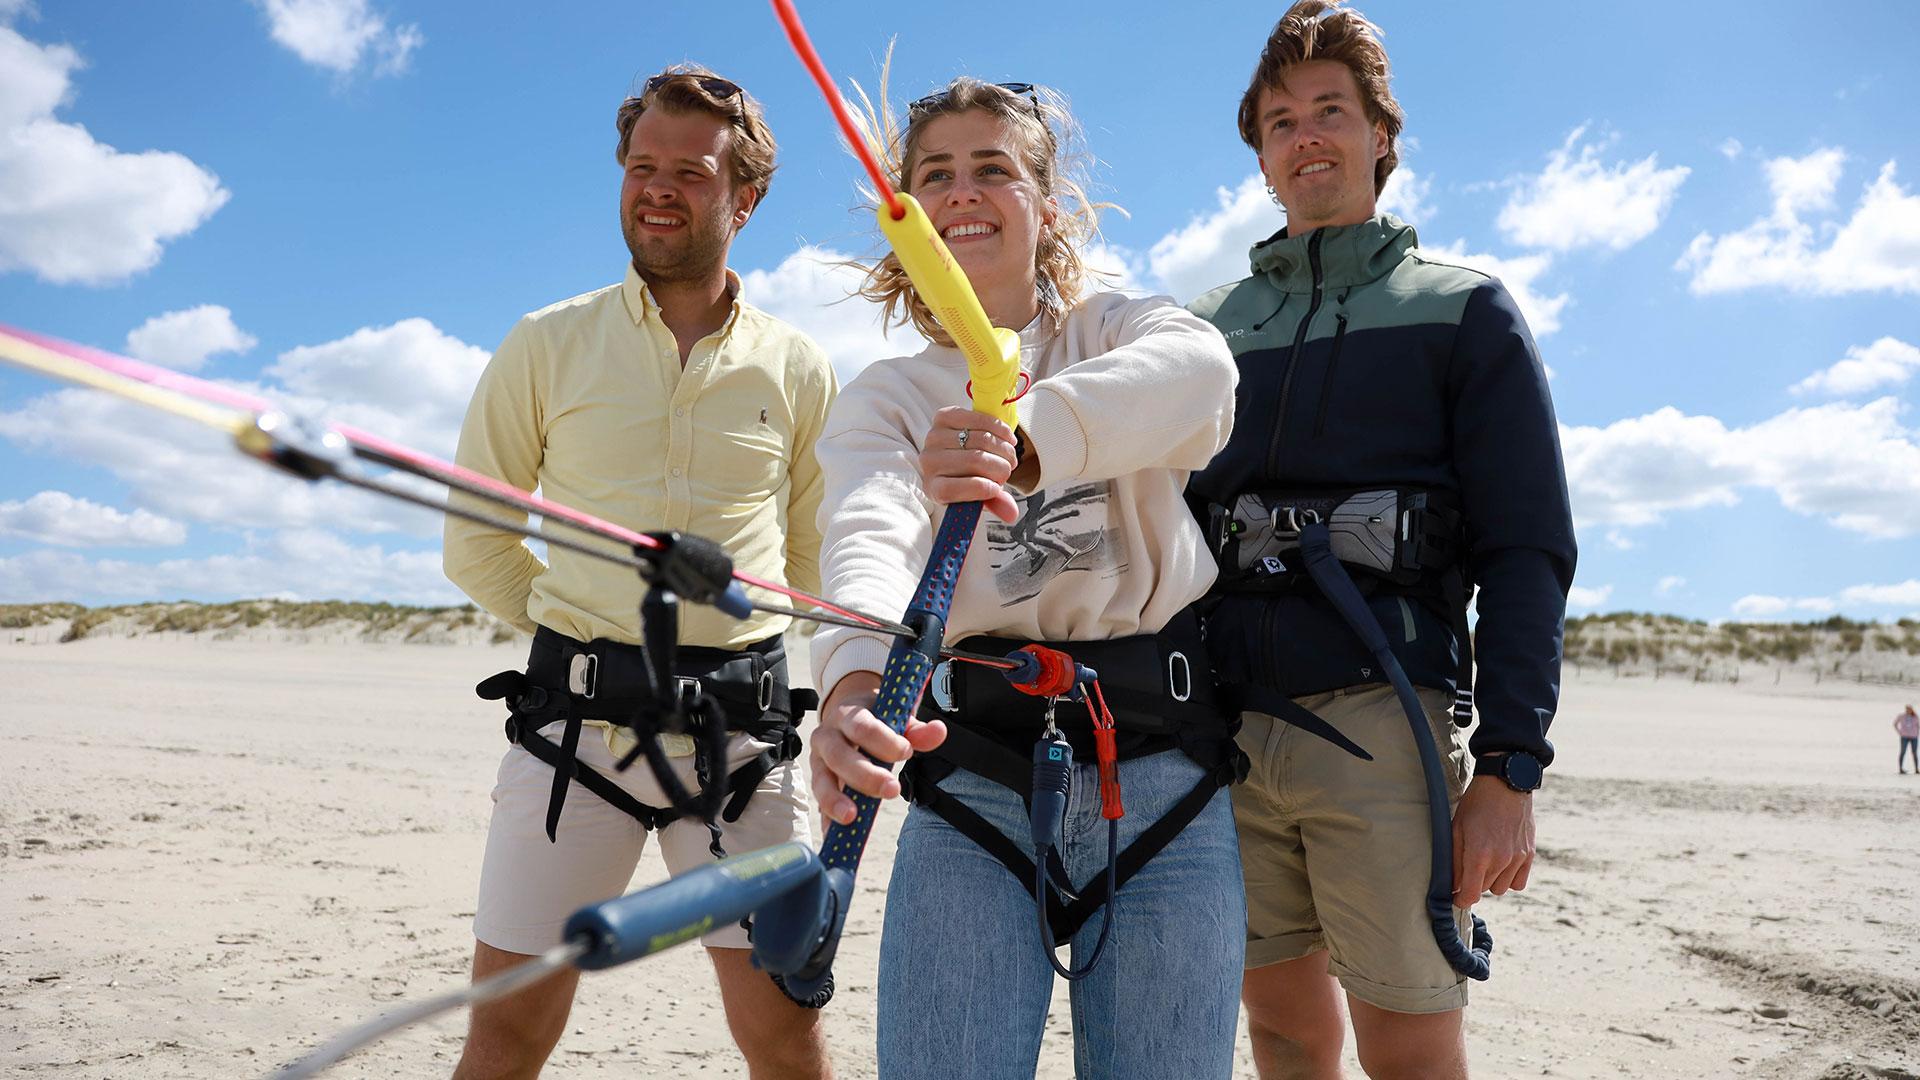 Klaar voor je eerste kitesurfles?